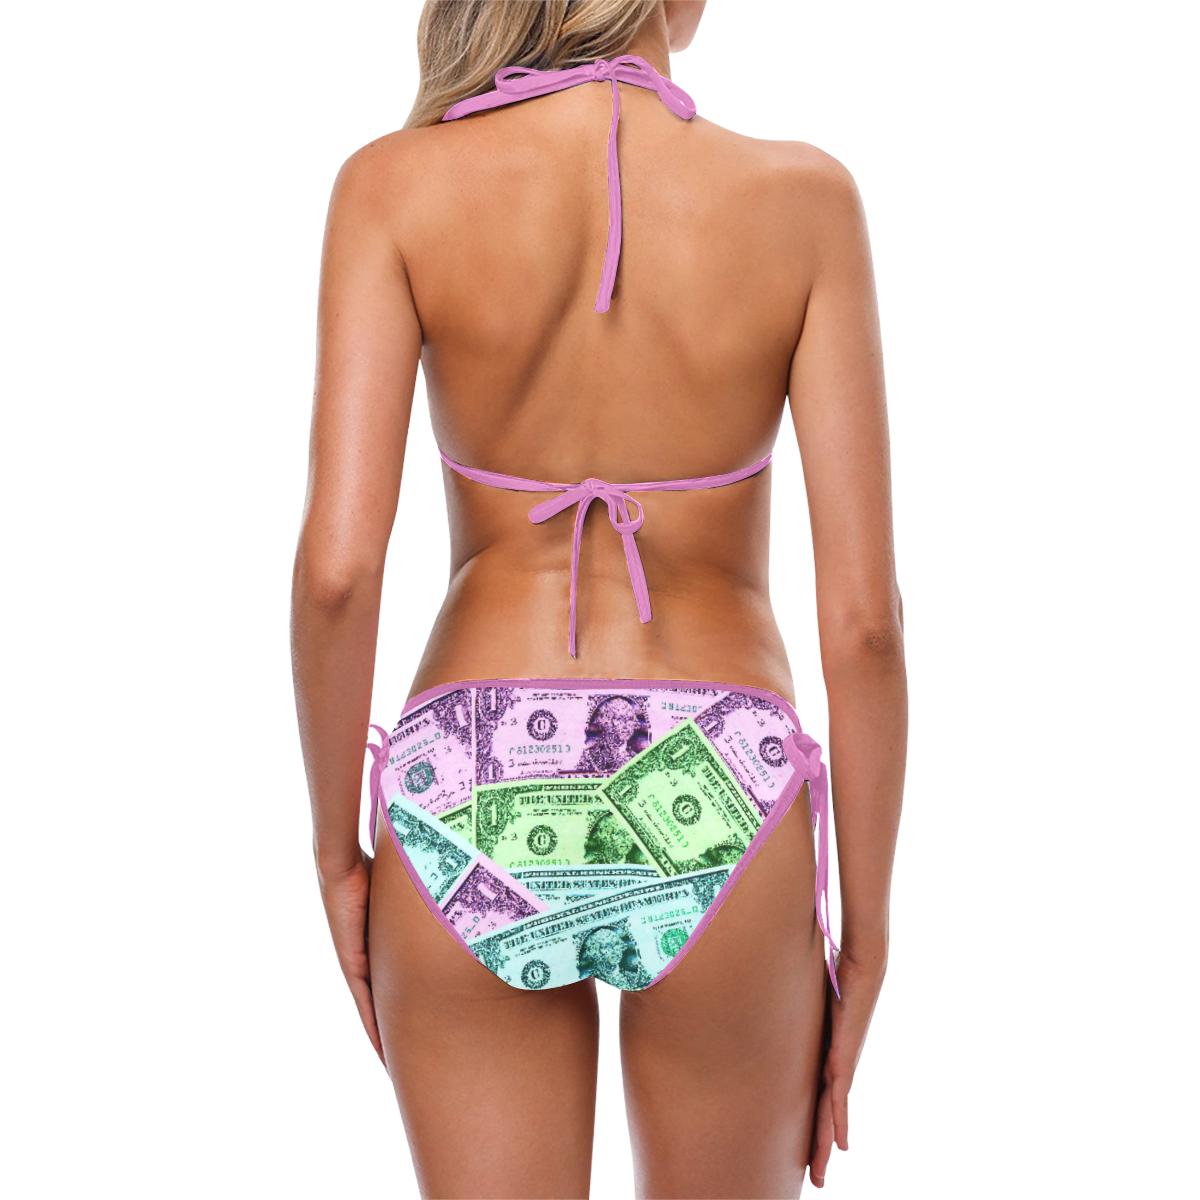 monopoly Custom Bikini Swimsuit (Model S01)